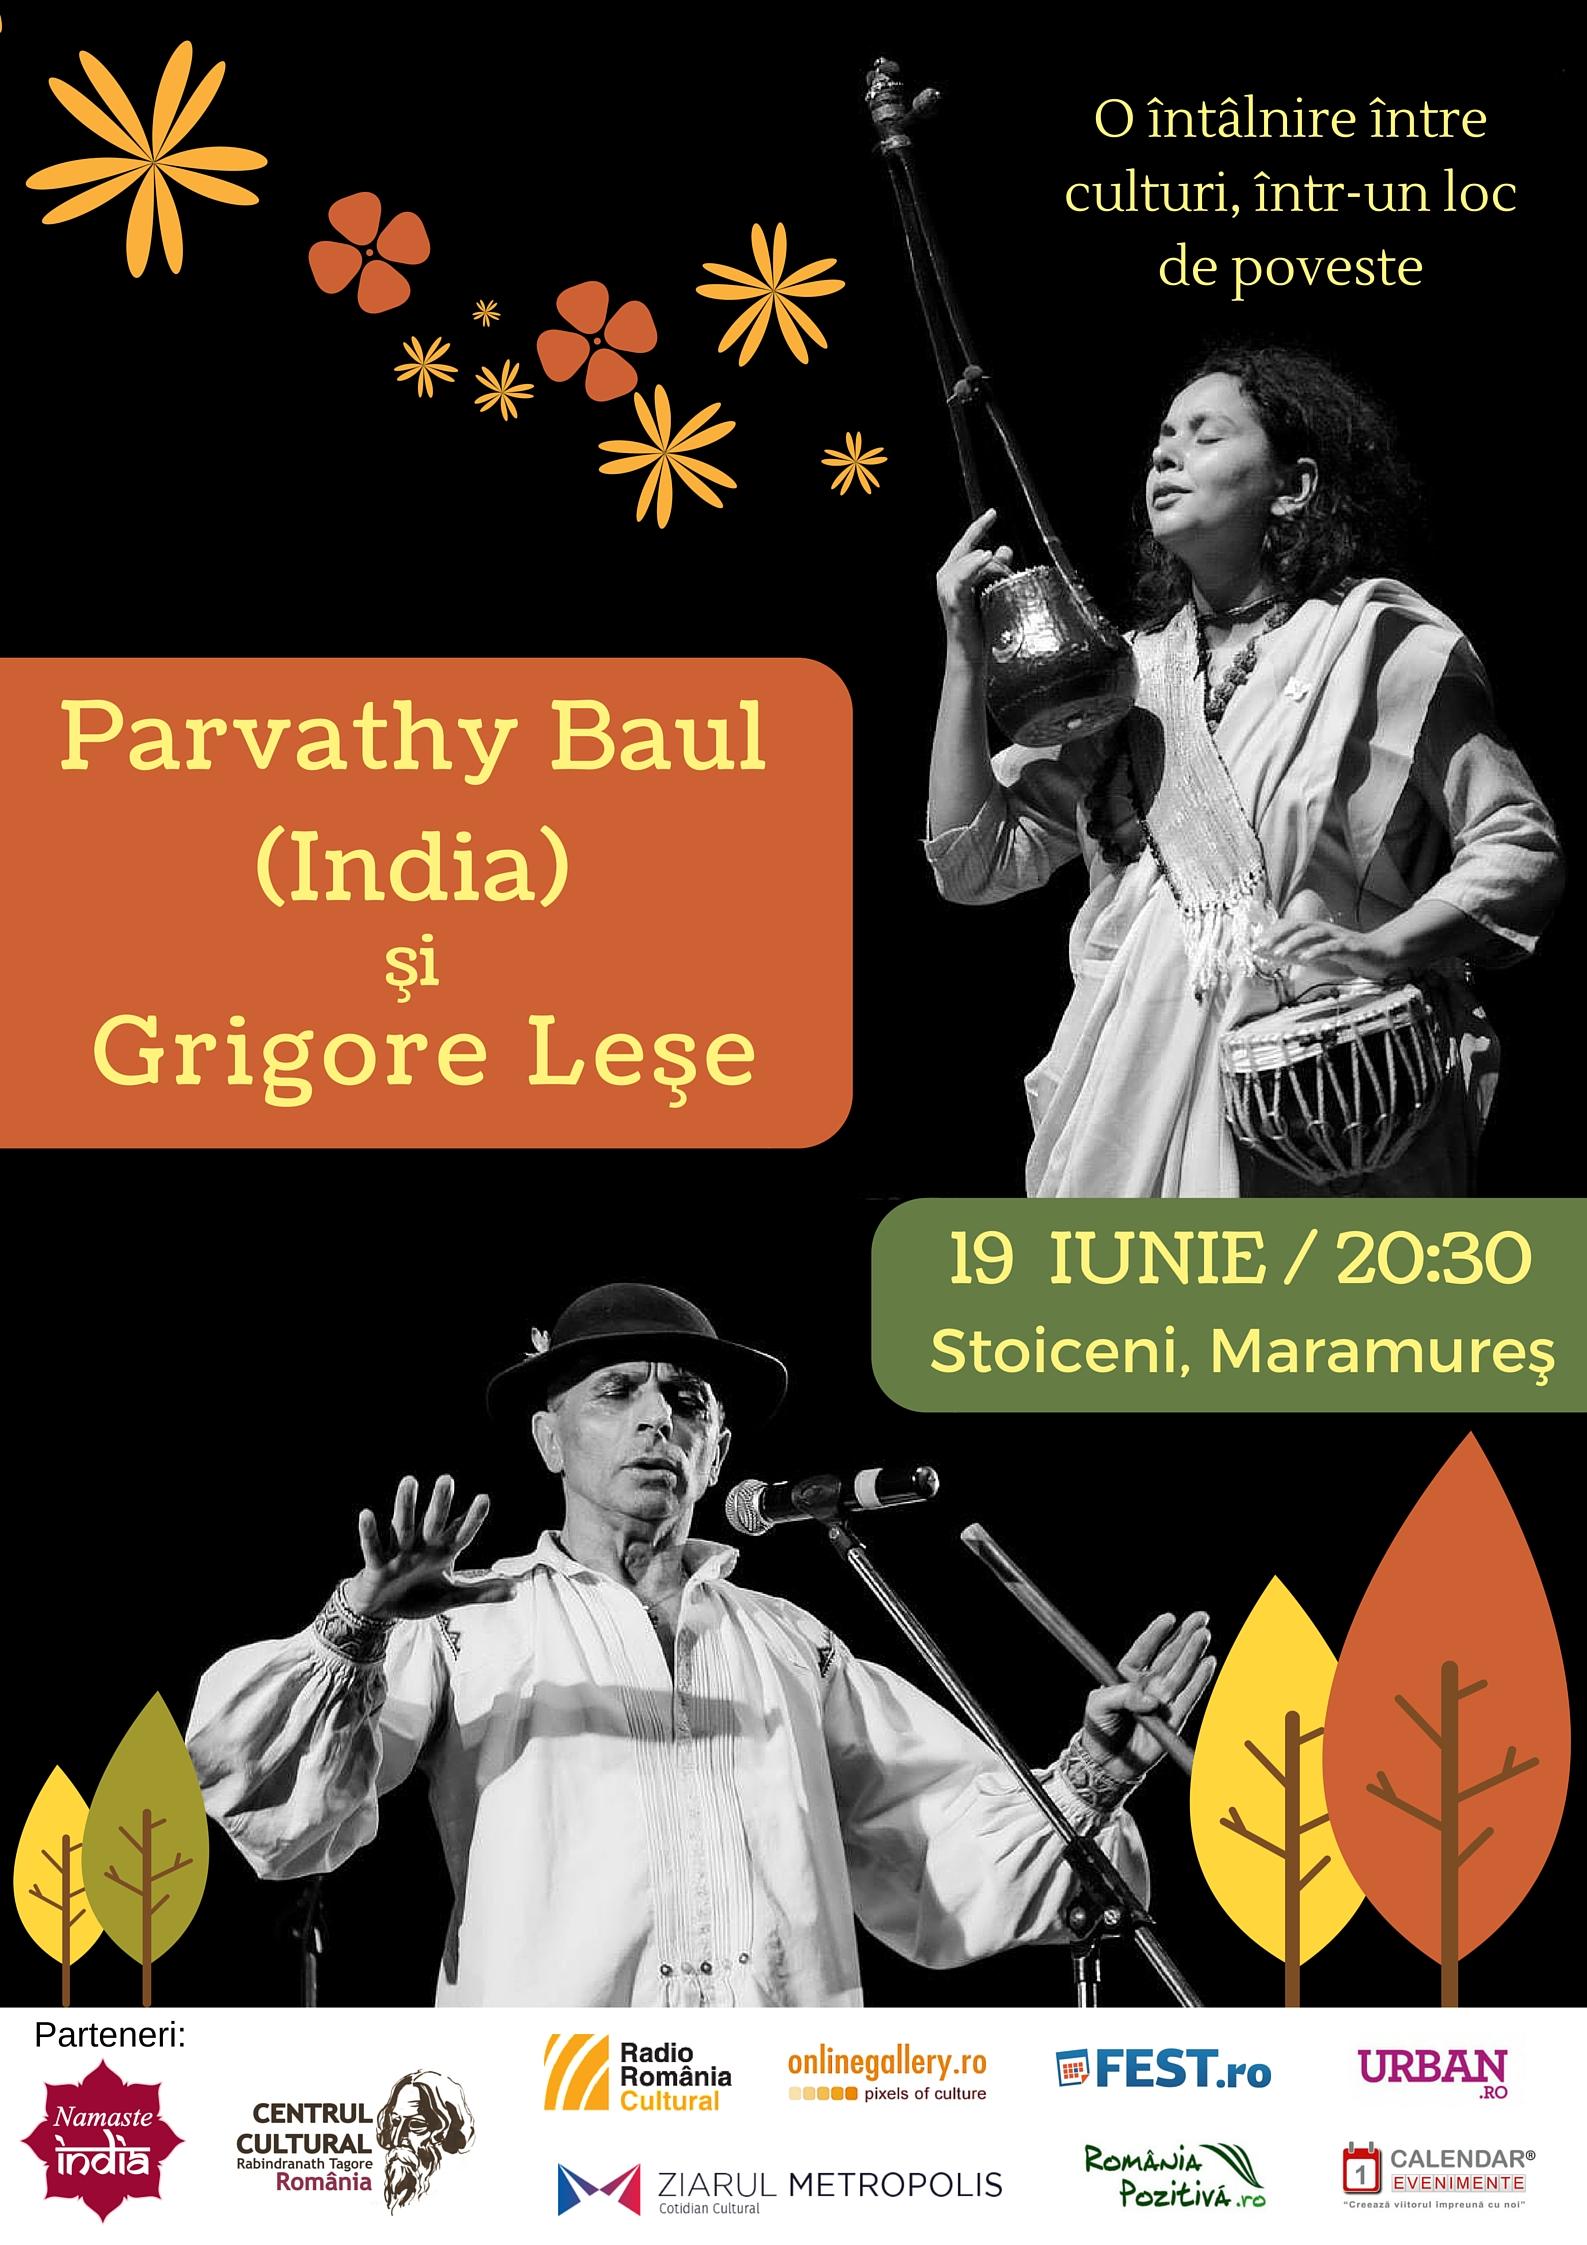 Concert Parvathy Baul & Grigore Lese